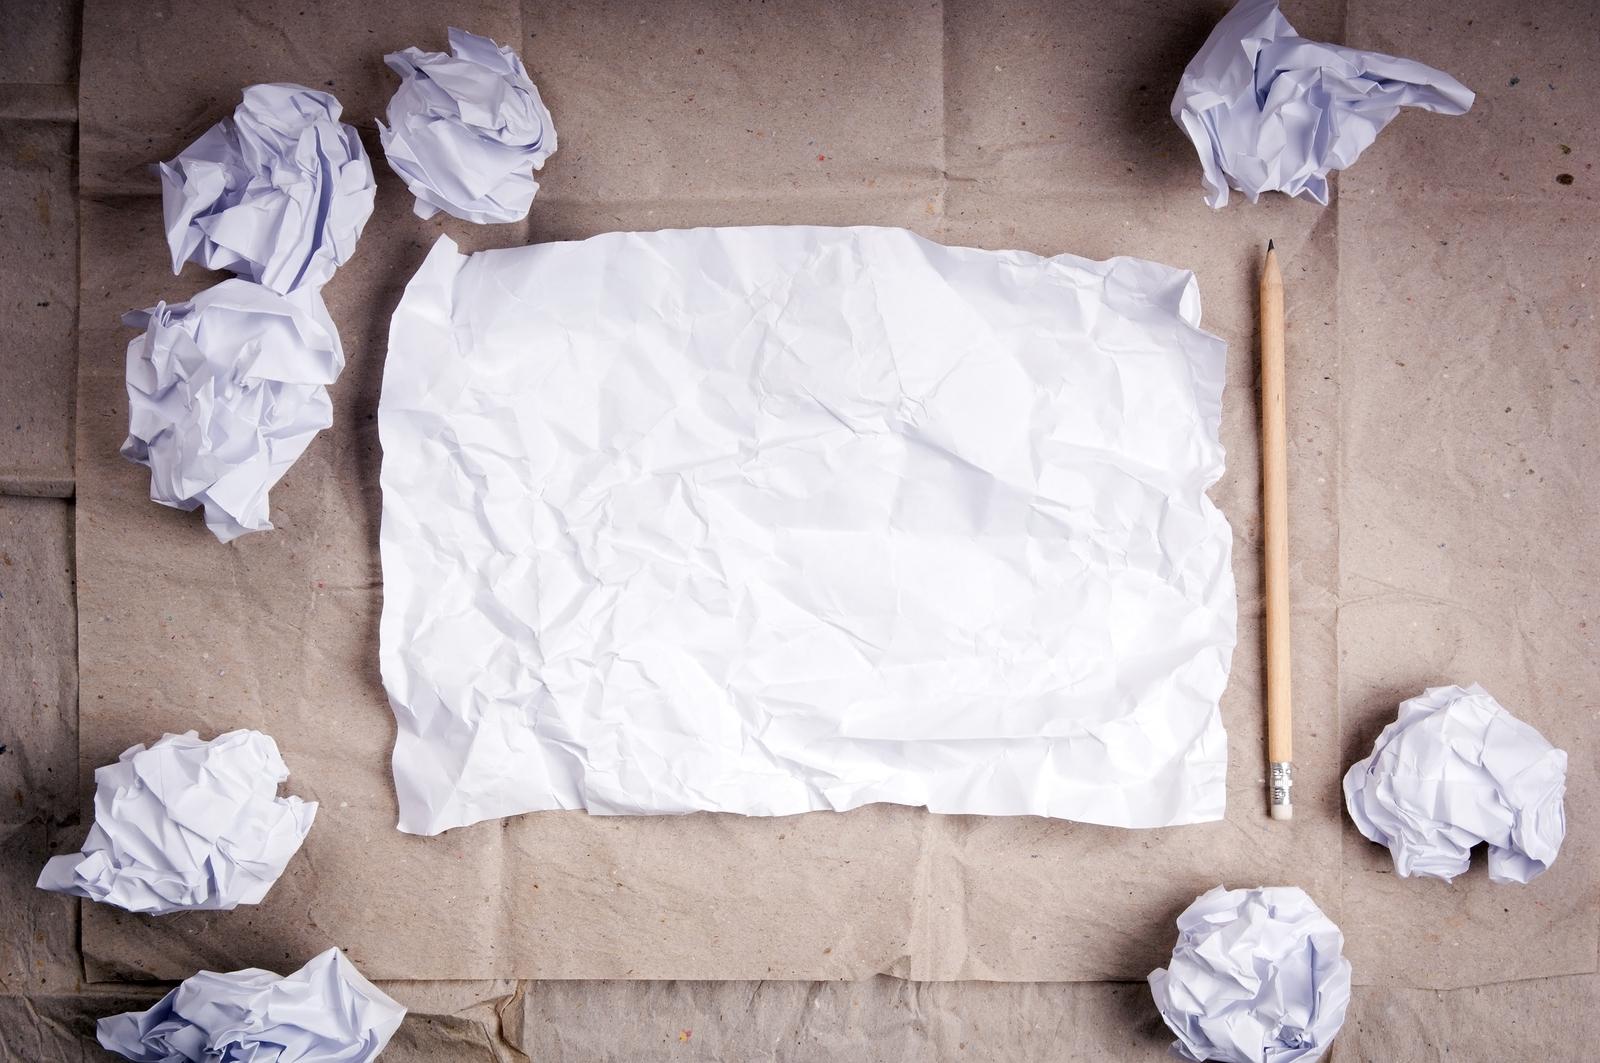 bigstock-Crumpled-Paper-Background-34764074.jpg